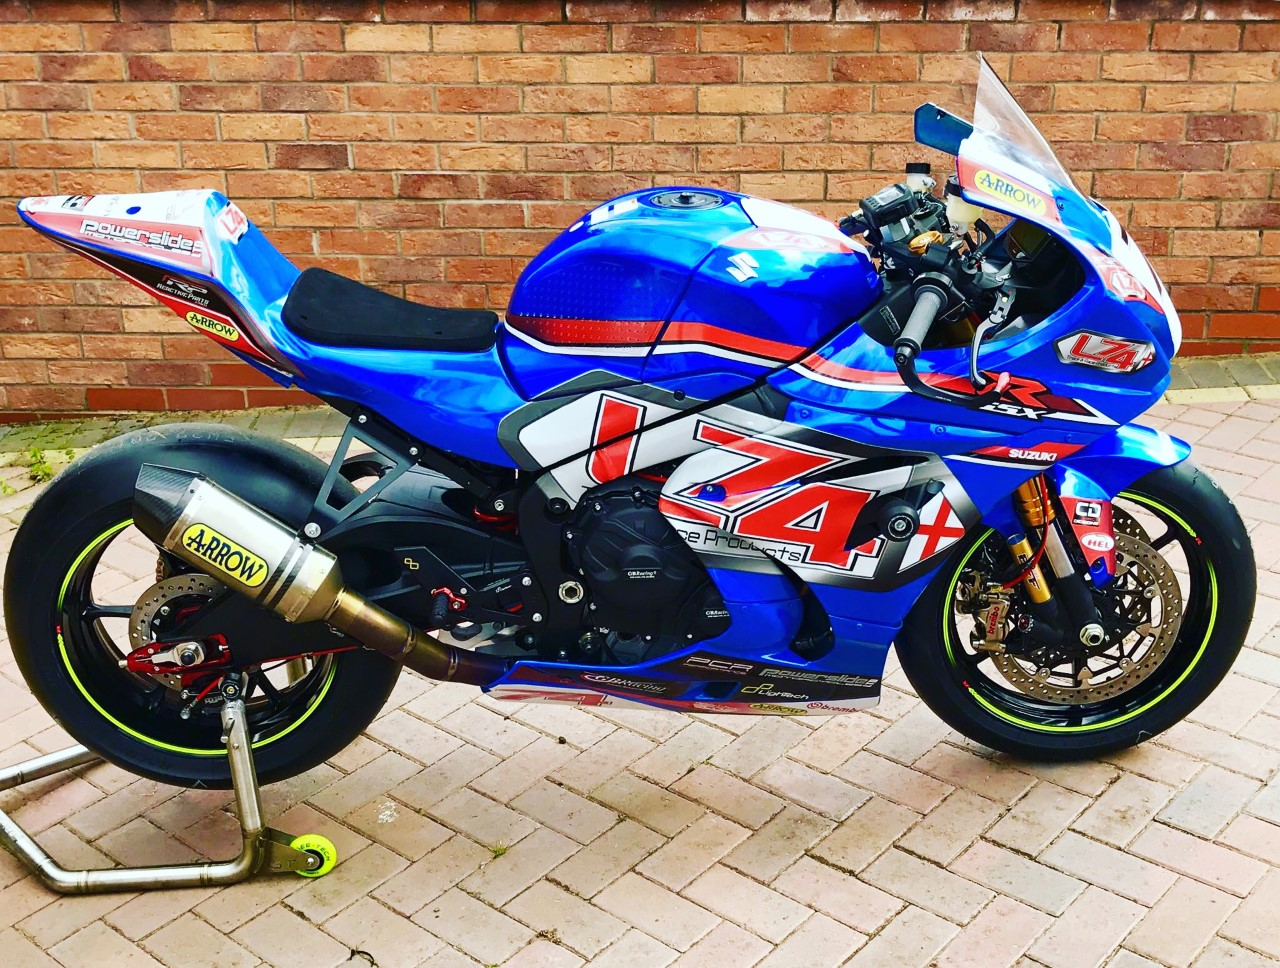 Profibre Fibreglass motorcycle bodywork